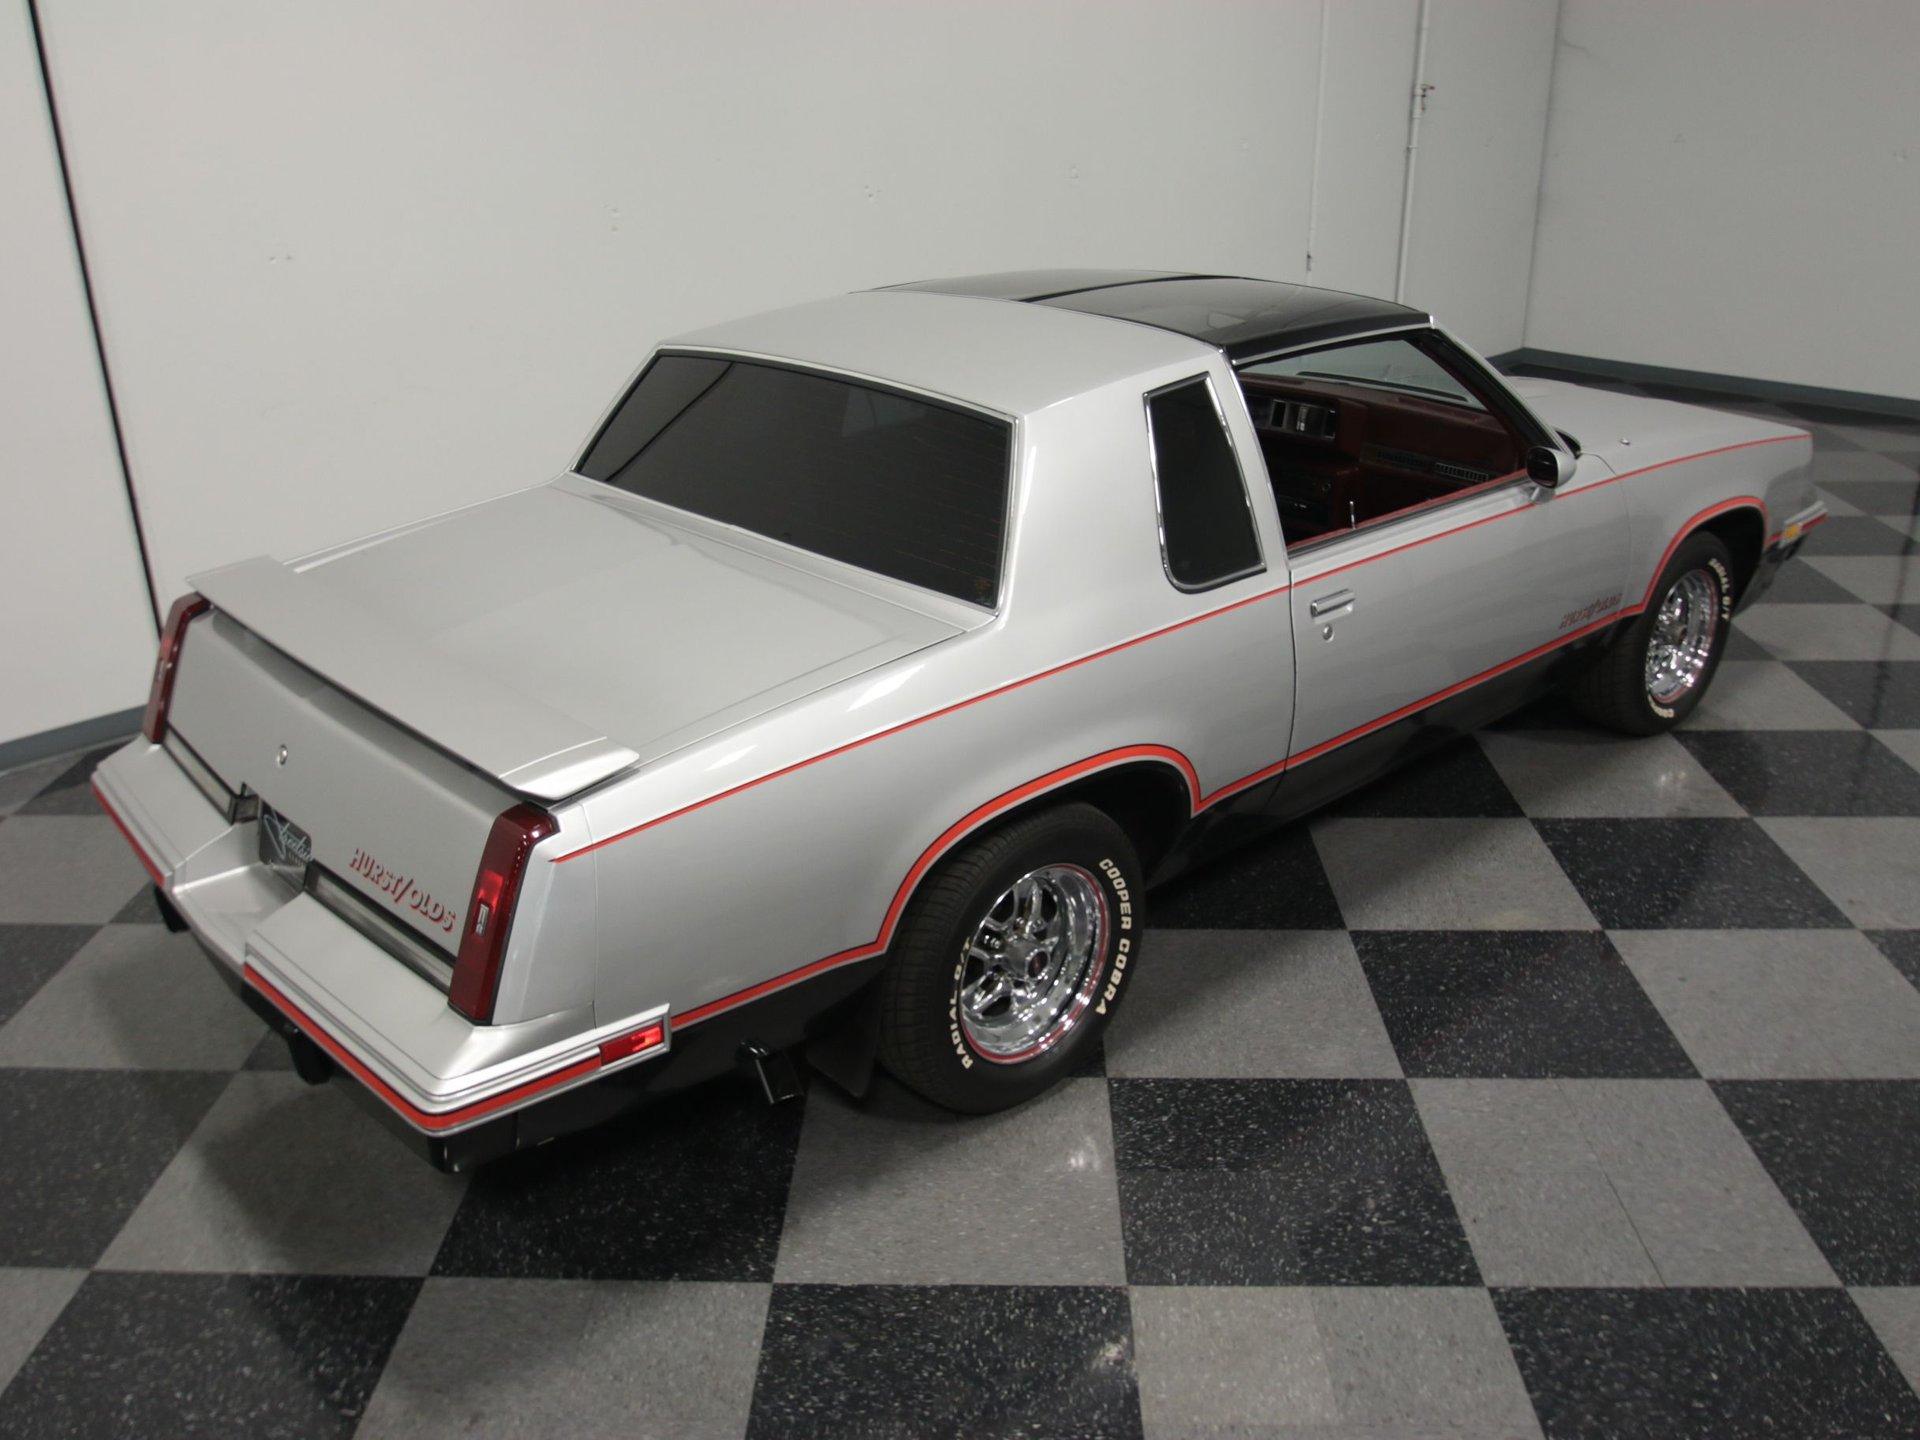 1984 Oldsmobile Cutlass | Streetside Classics - The Nation's